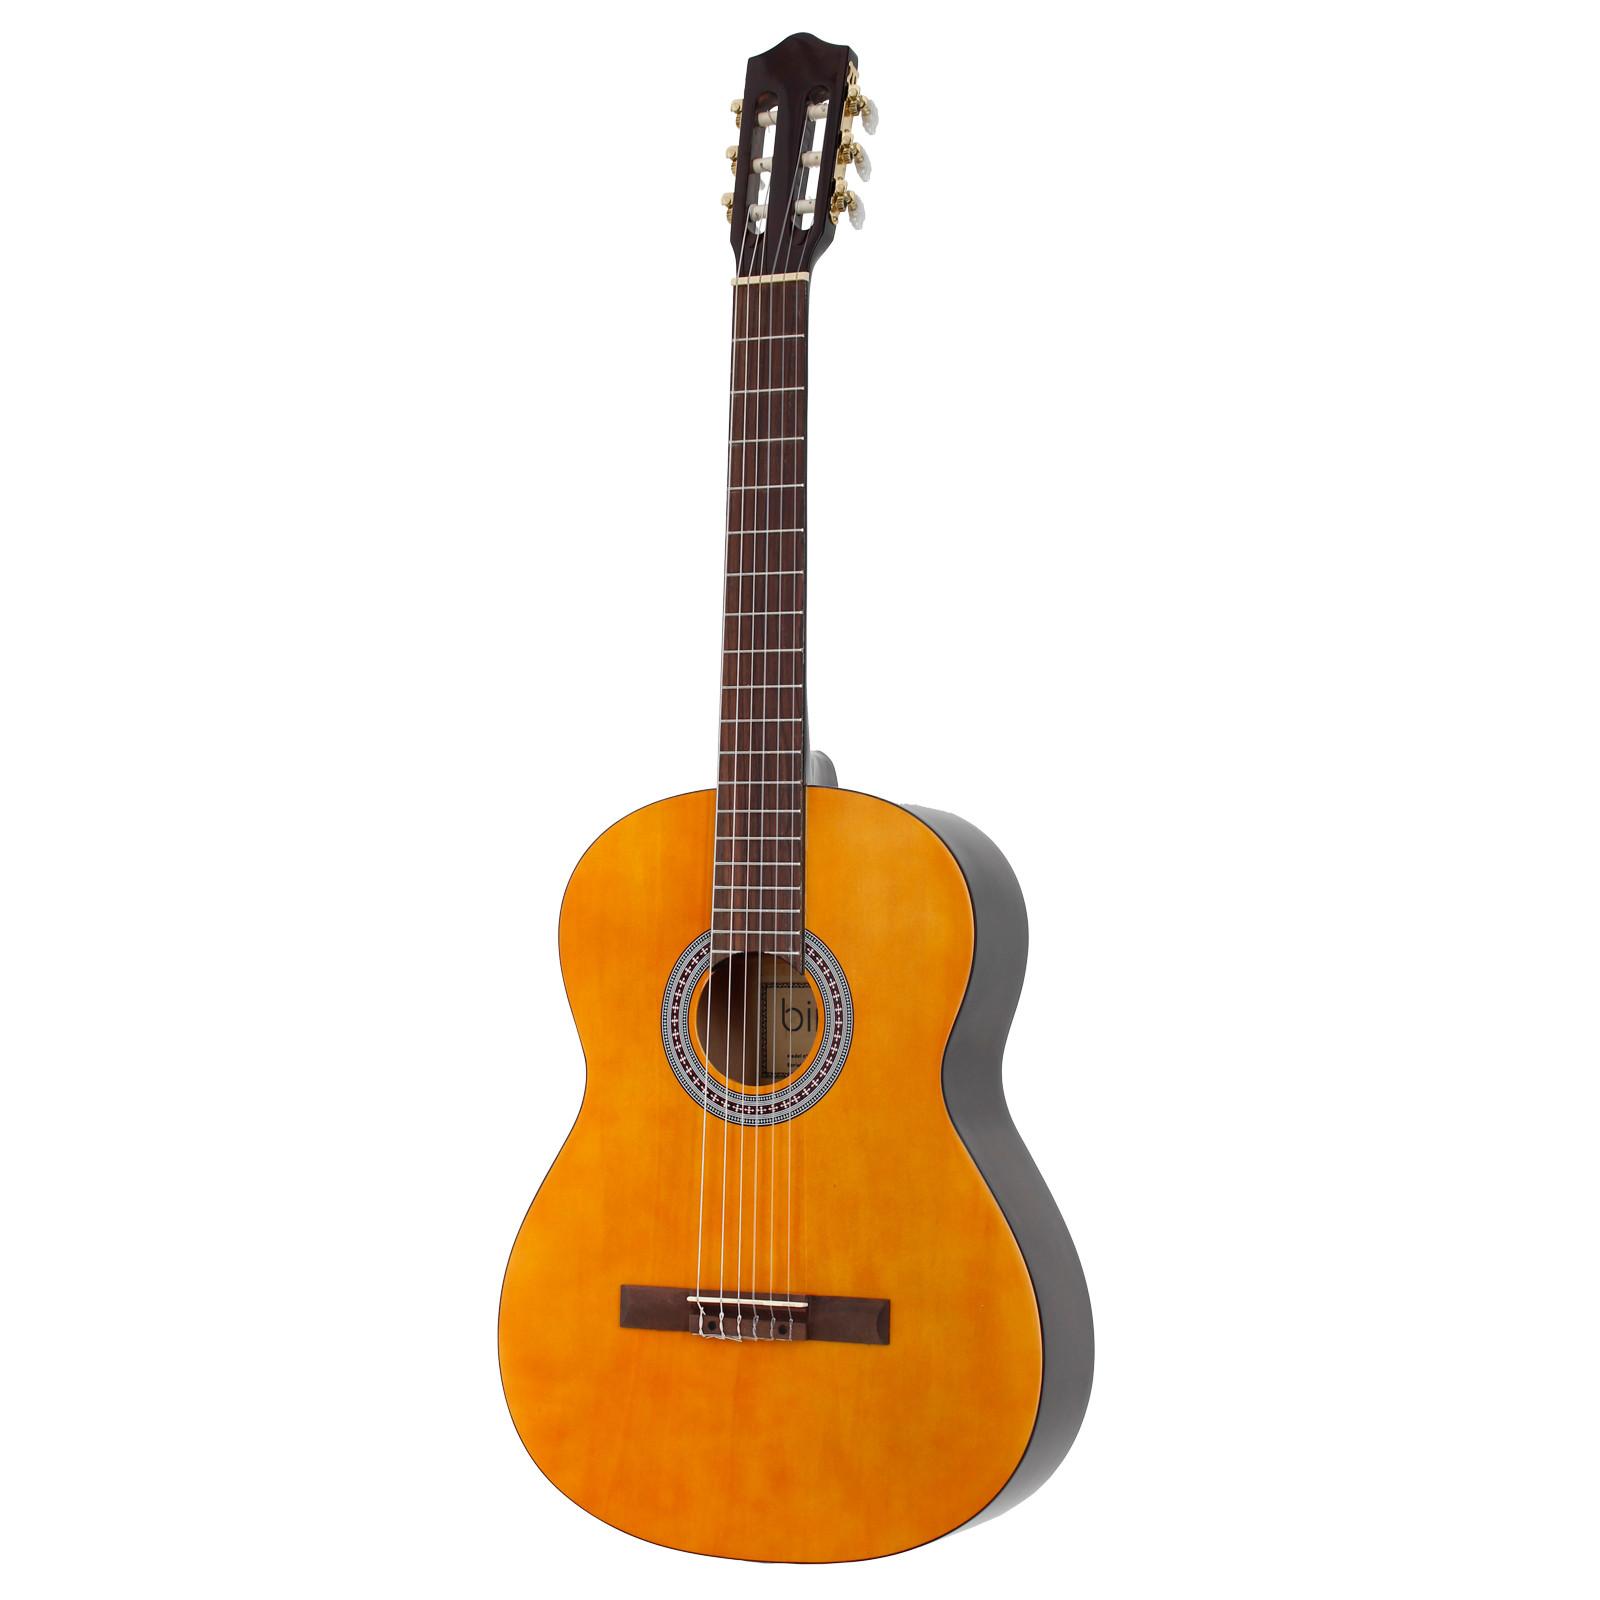 guitare classique 1 4 guitar buy online free. Black Bedroom Furniture Sets. Home Design Ideas